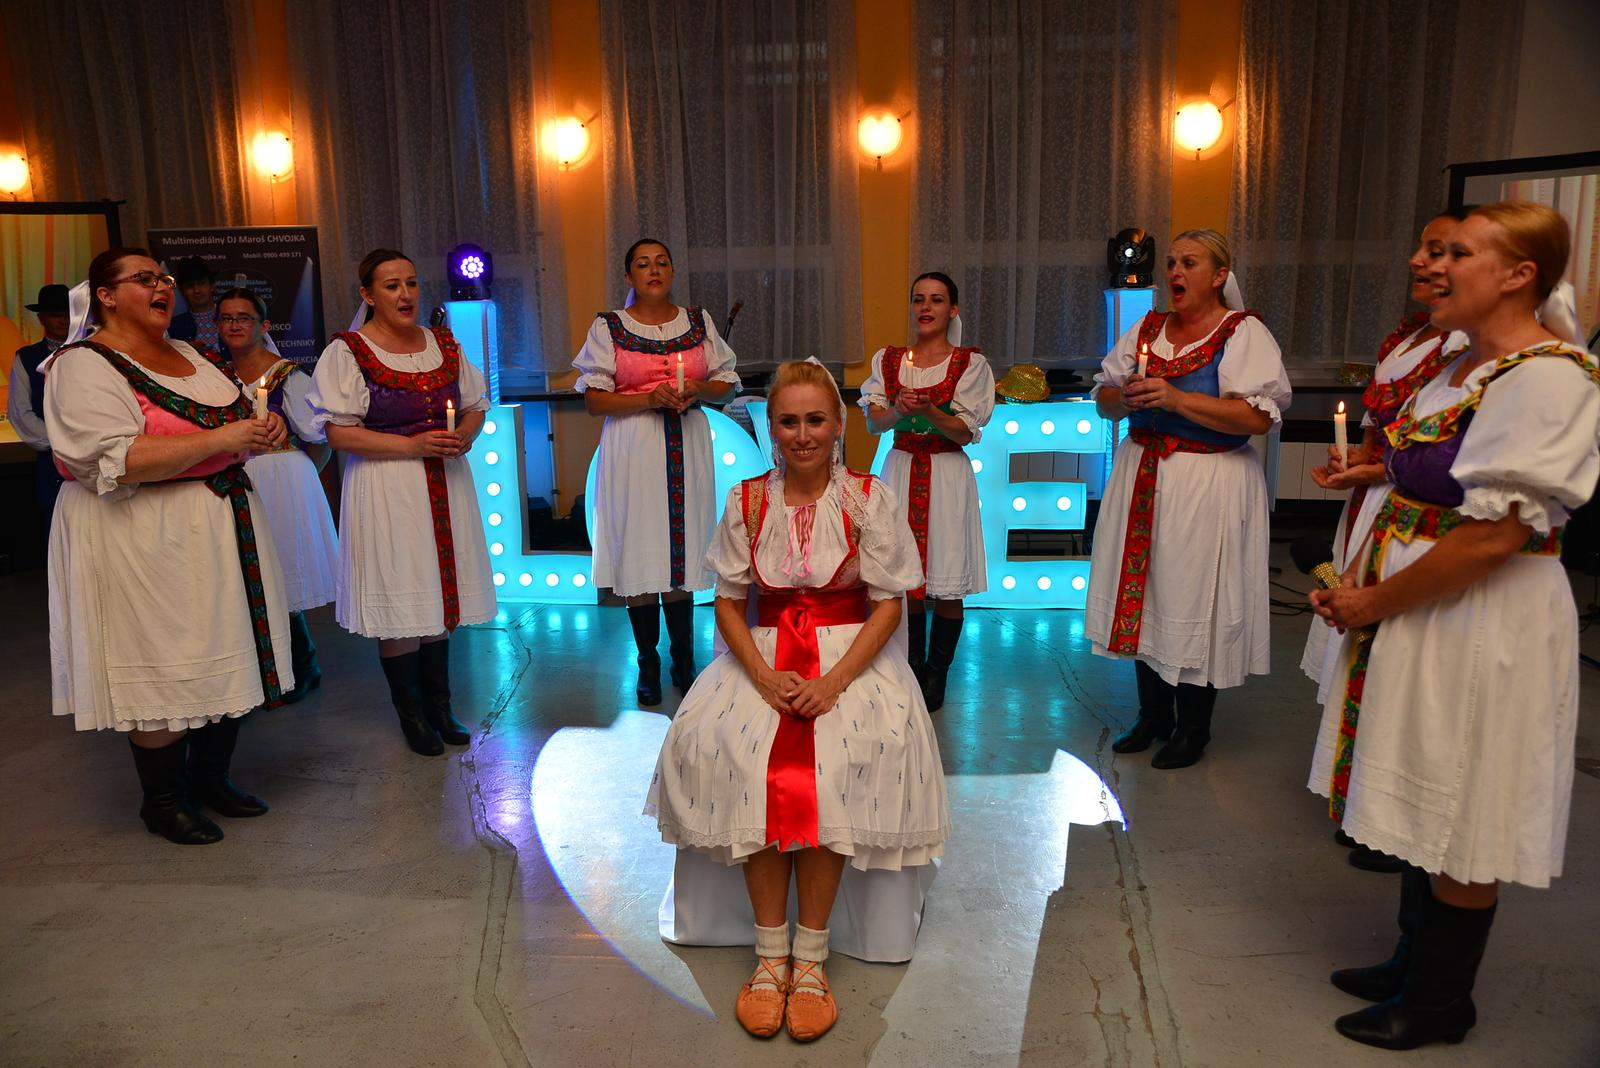 Folklorna svadba M+M, 24.8.2019 Turany - Folklorna svadba M+M, 24.8.2019 Turany, autor Foto: Multimediálny DJ Maroš Chvojka 012